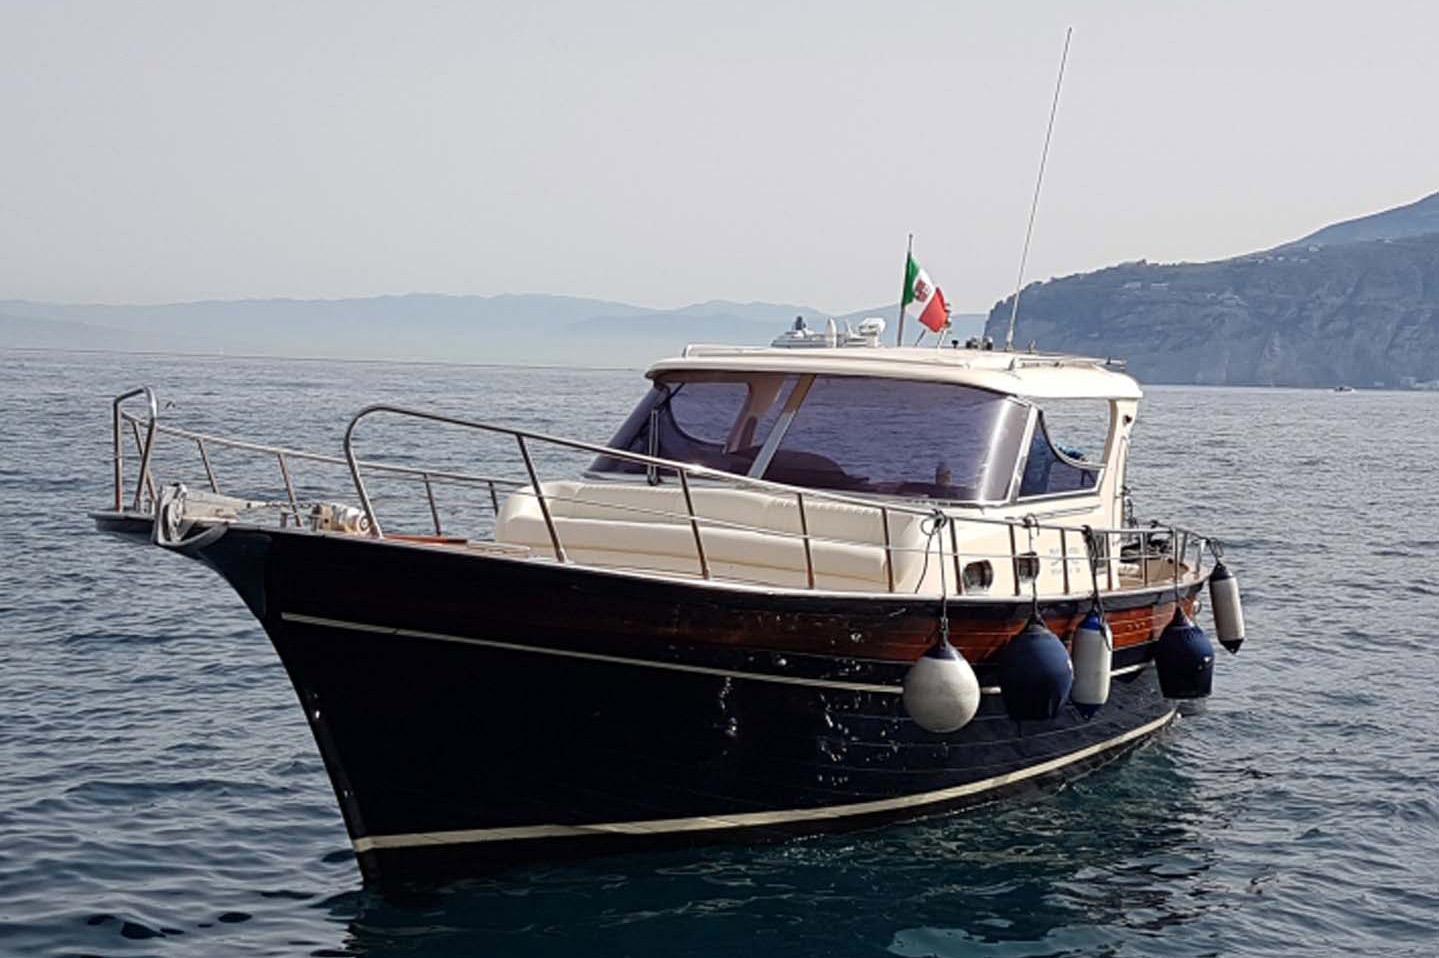 alfamarine charter fratelli aprea tour boat rental sorrento capri